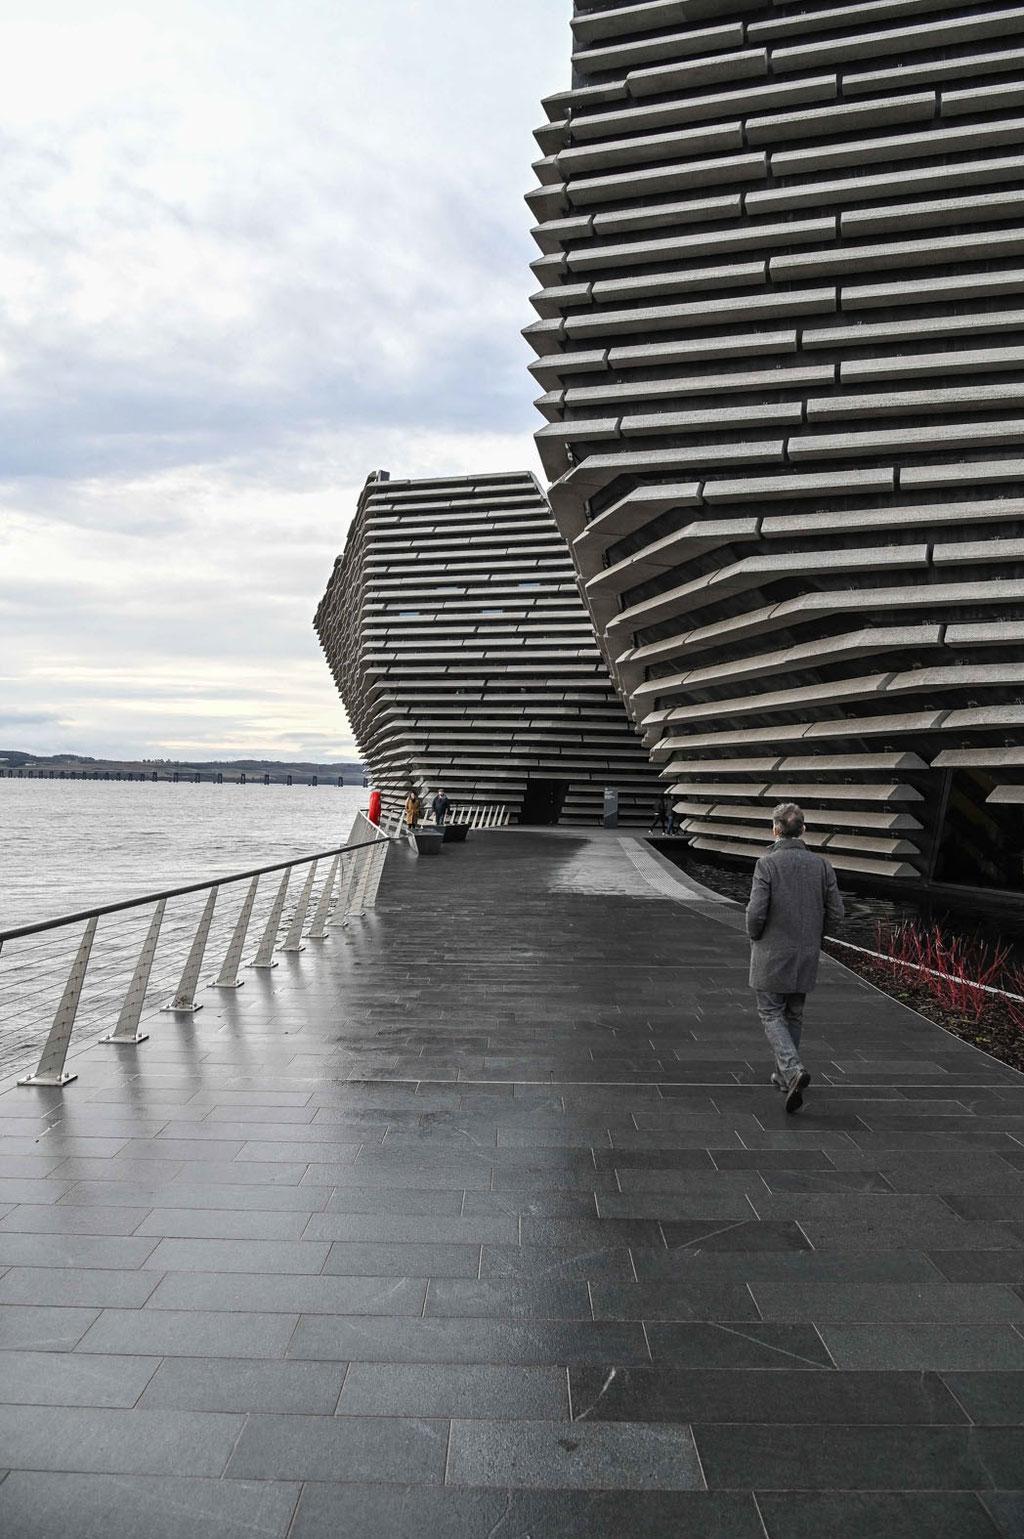 Victoria & Albert Museum (Kengo Kuma & Associates), Dundee (UK)